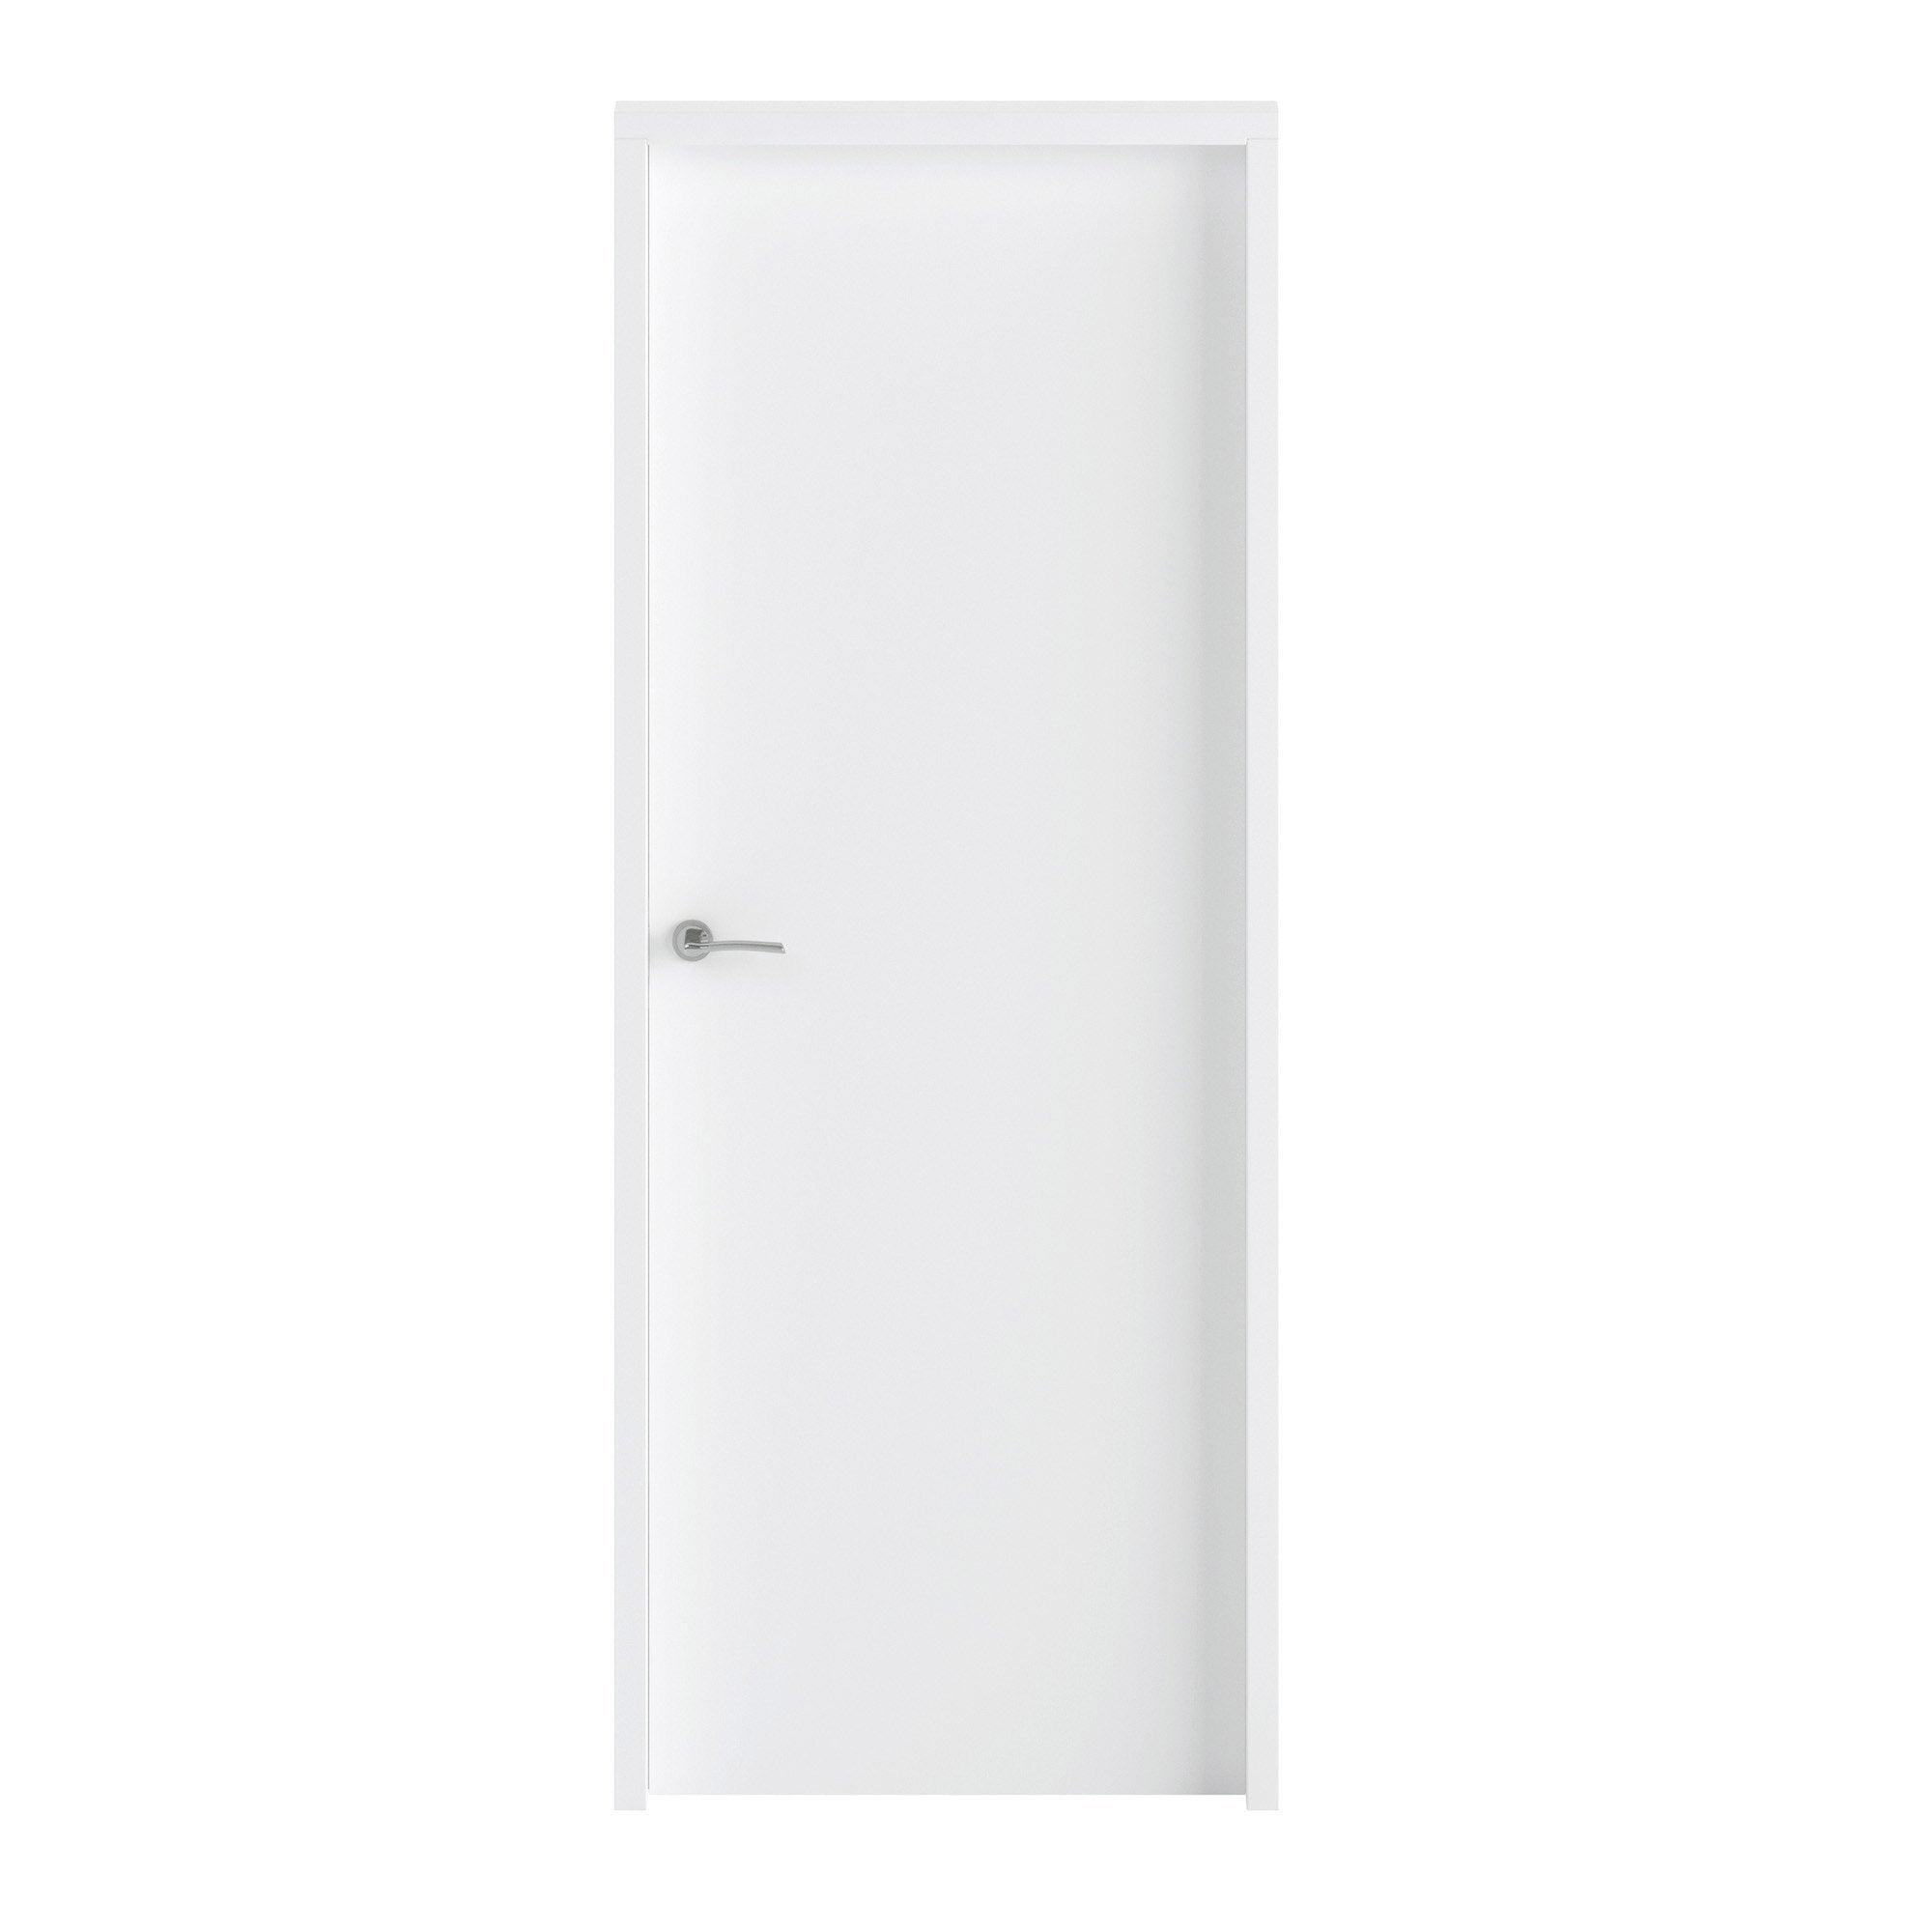 Bloc-porte blanc Loulou, blanc H.204 x l.83 cm, réversible